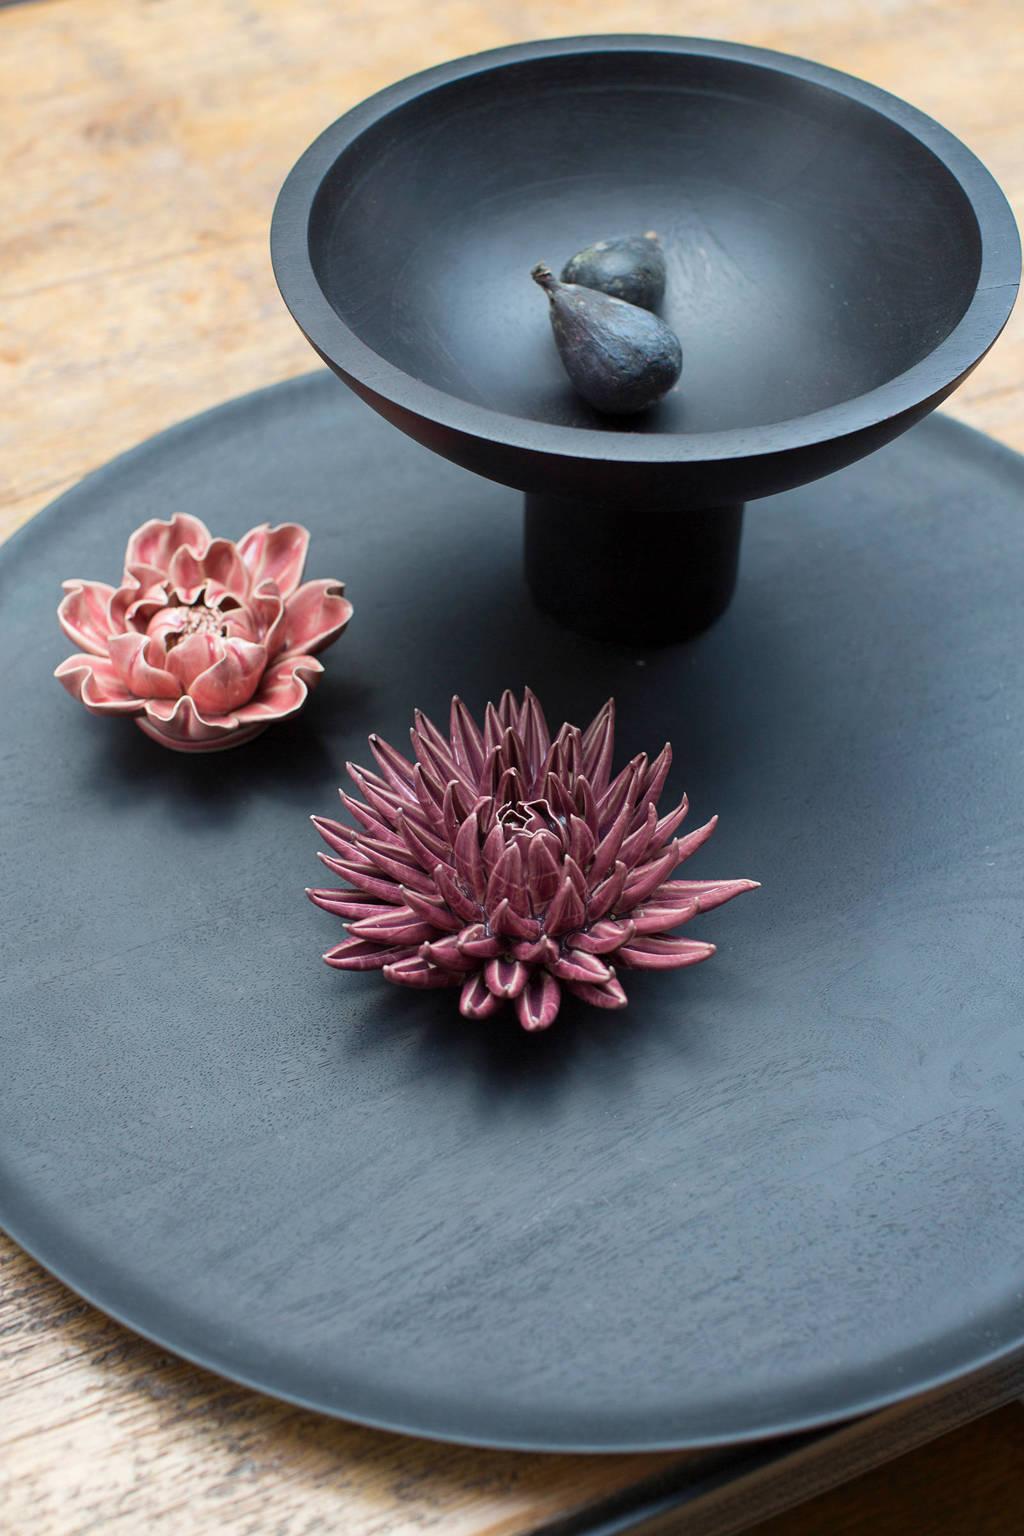 Urban Nature Culture Shizu houten serveerschaal (Ø25 cm), Bruin